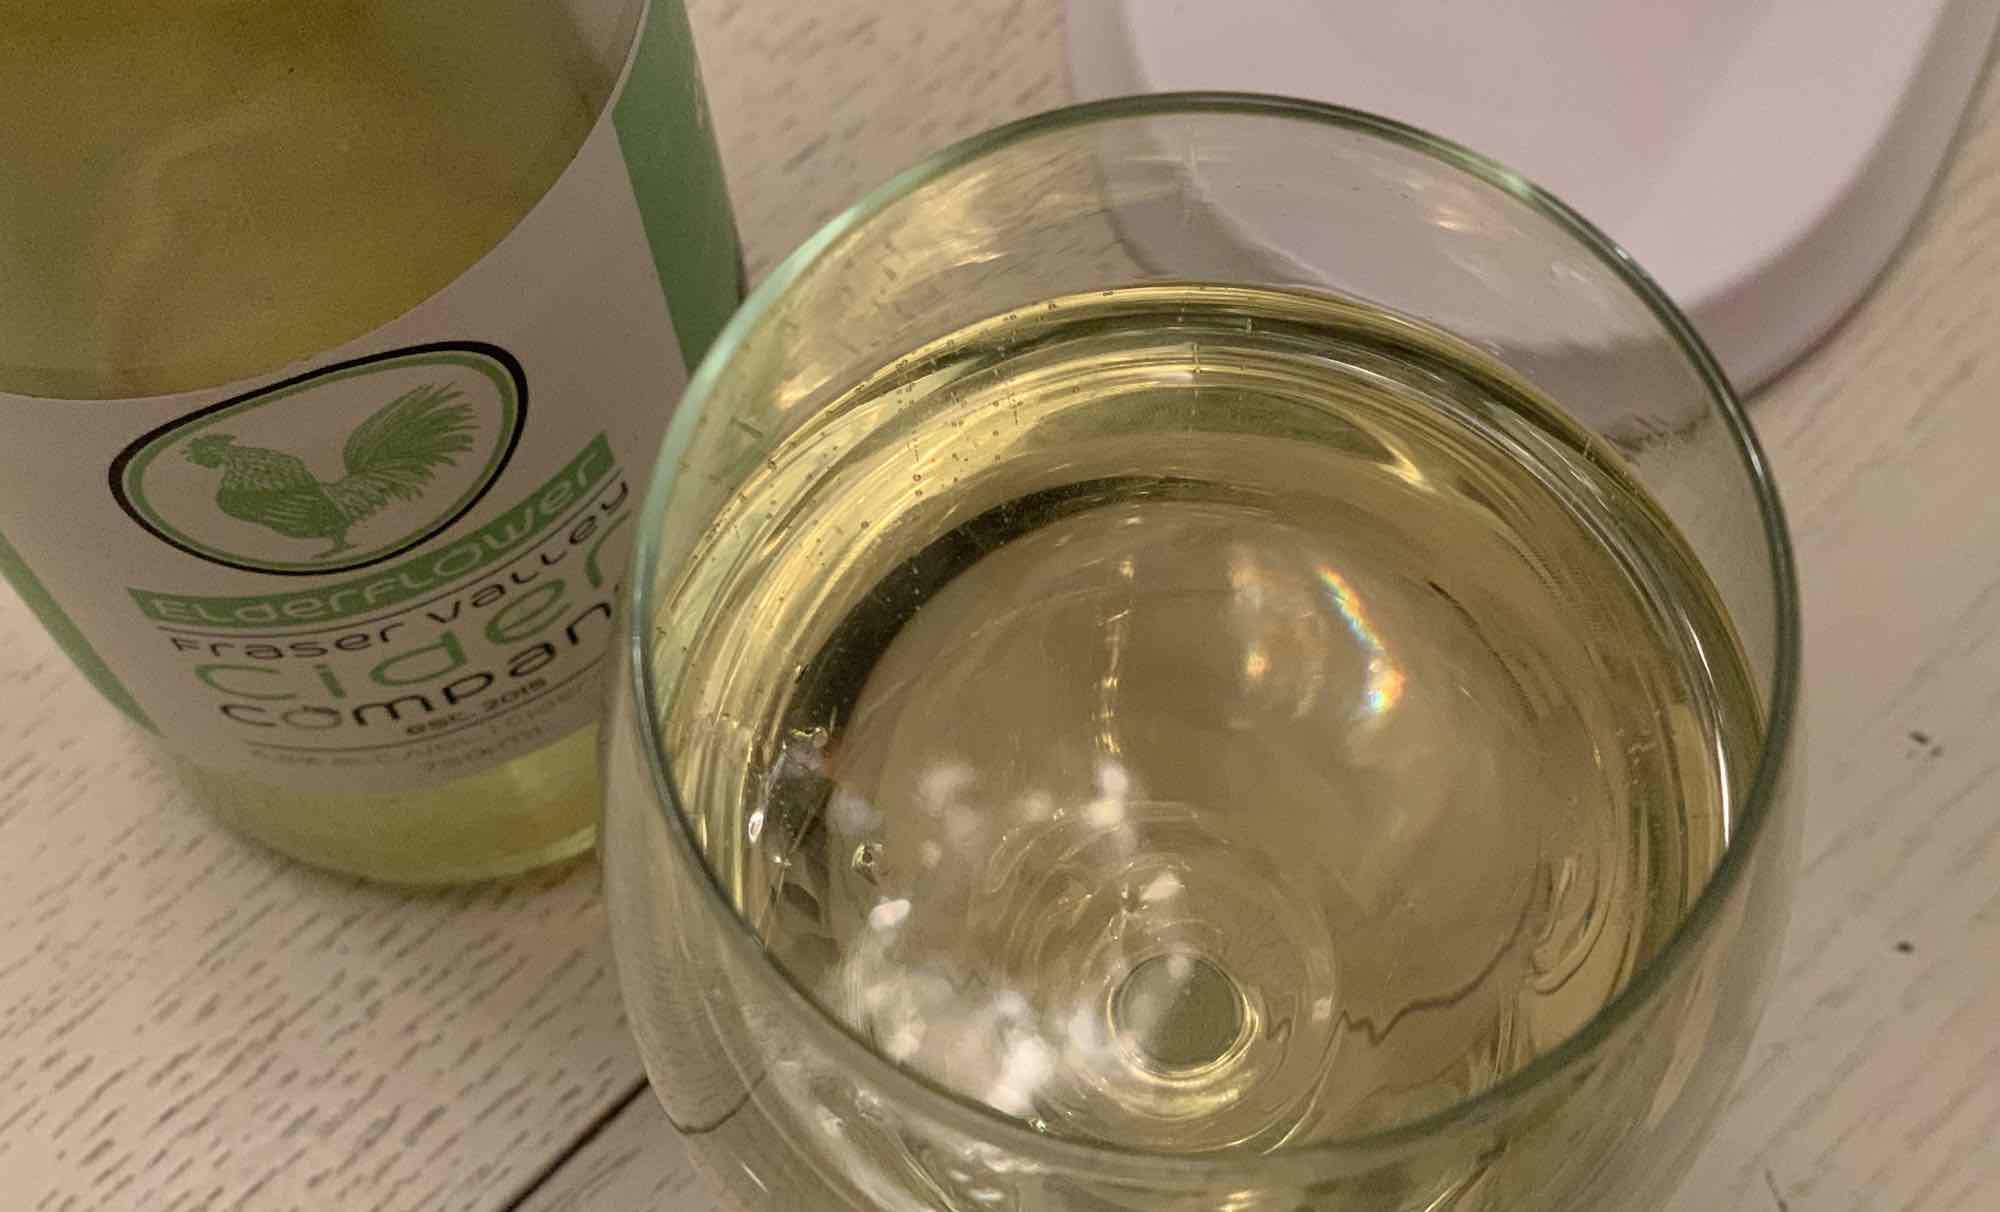 Drinkmate bubbly cider